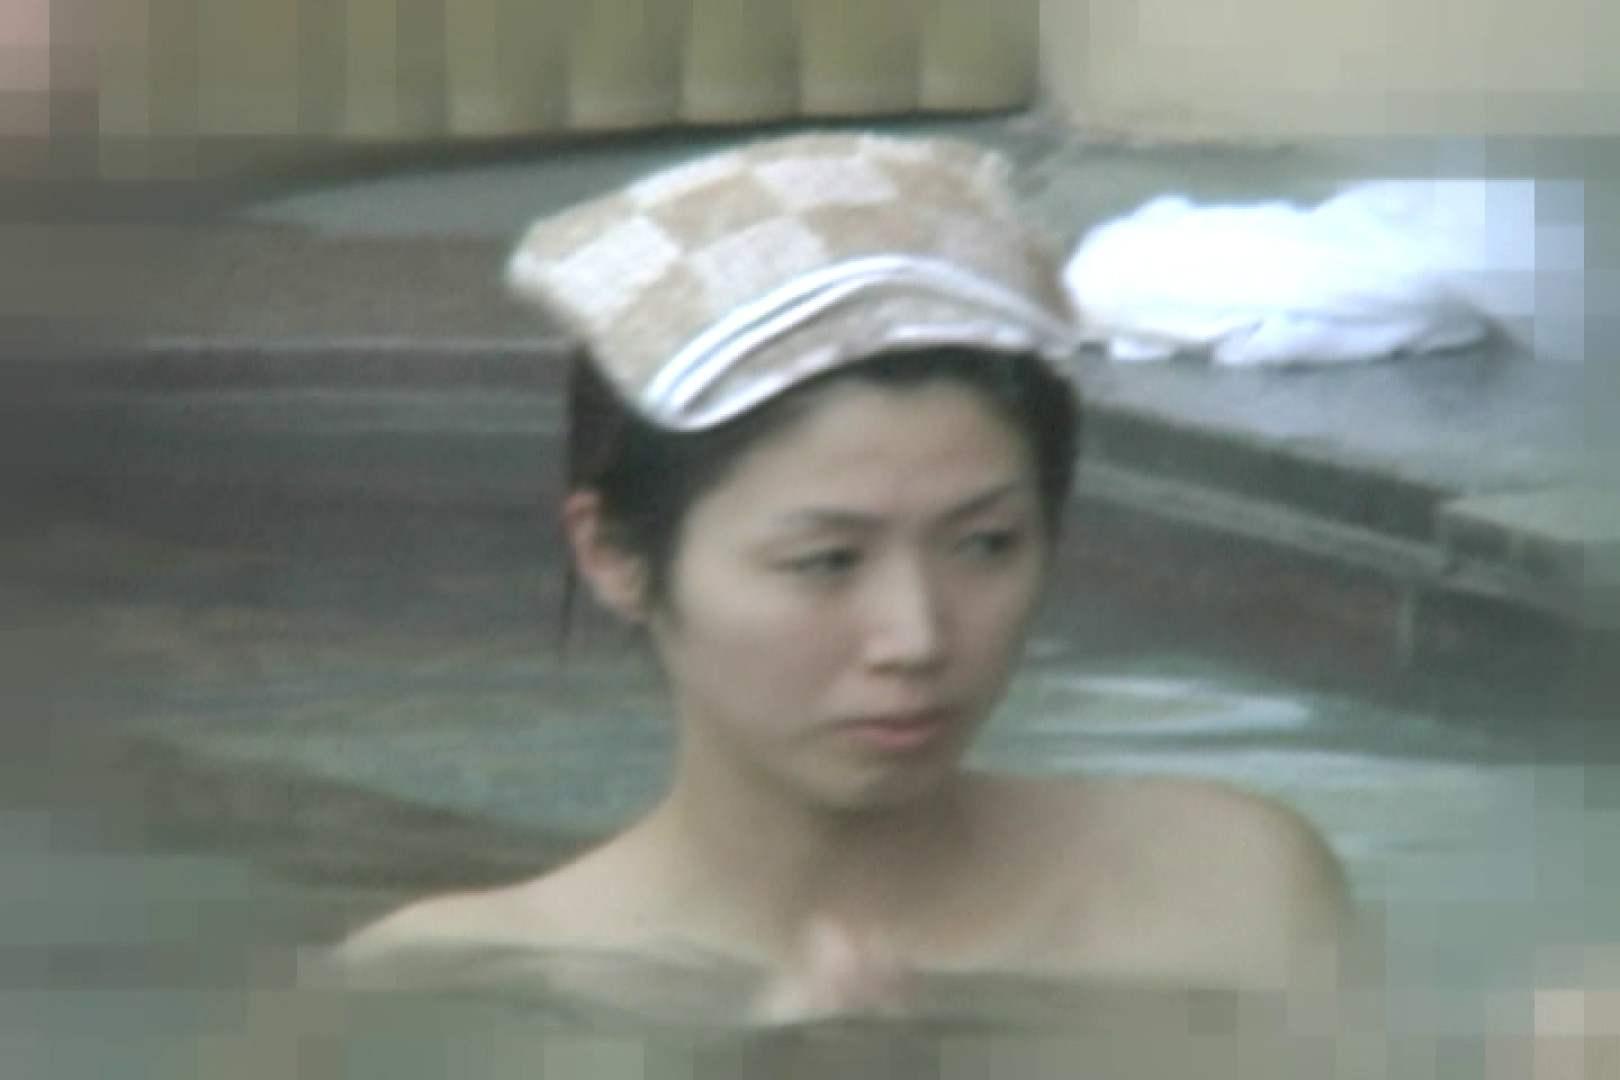 Aquaな露天風呂Vol.856 OLのエロ生活 SEX無修正画像 74連発 50